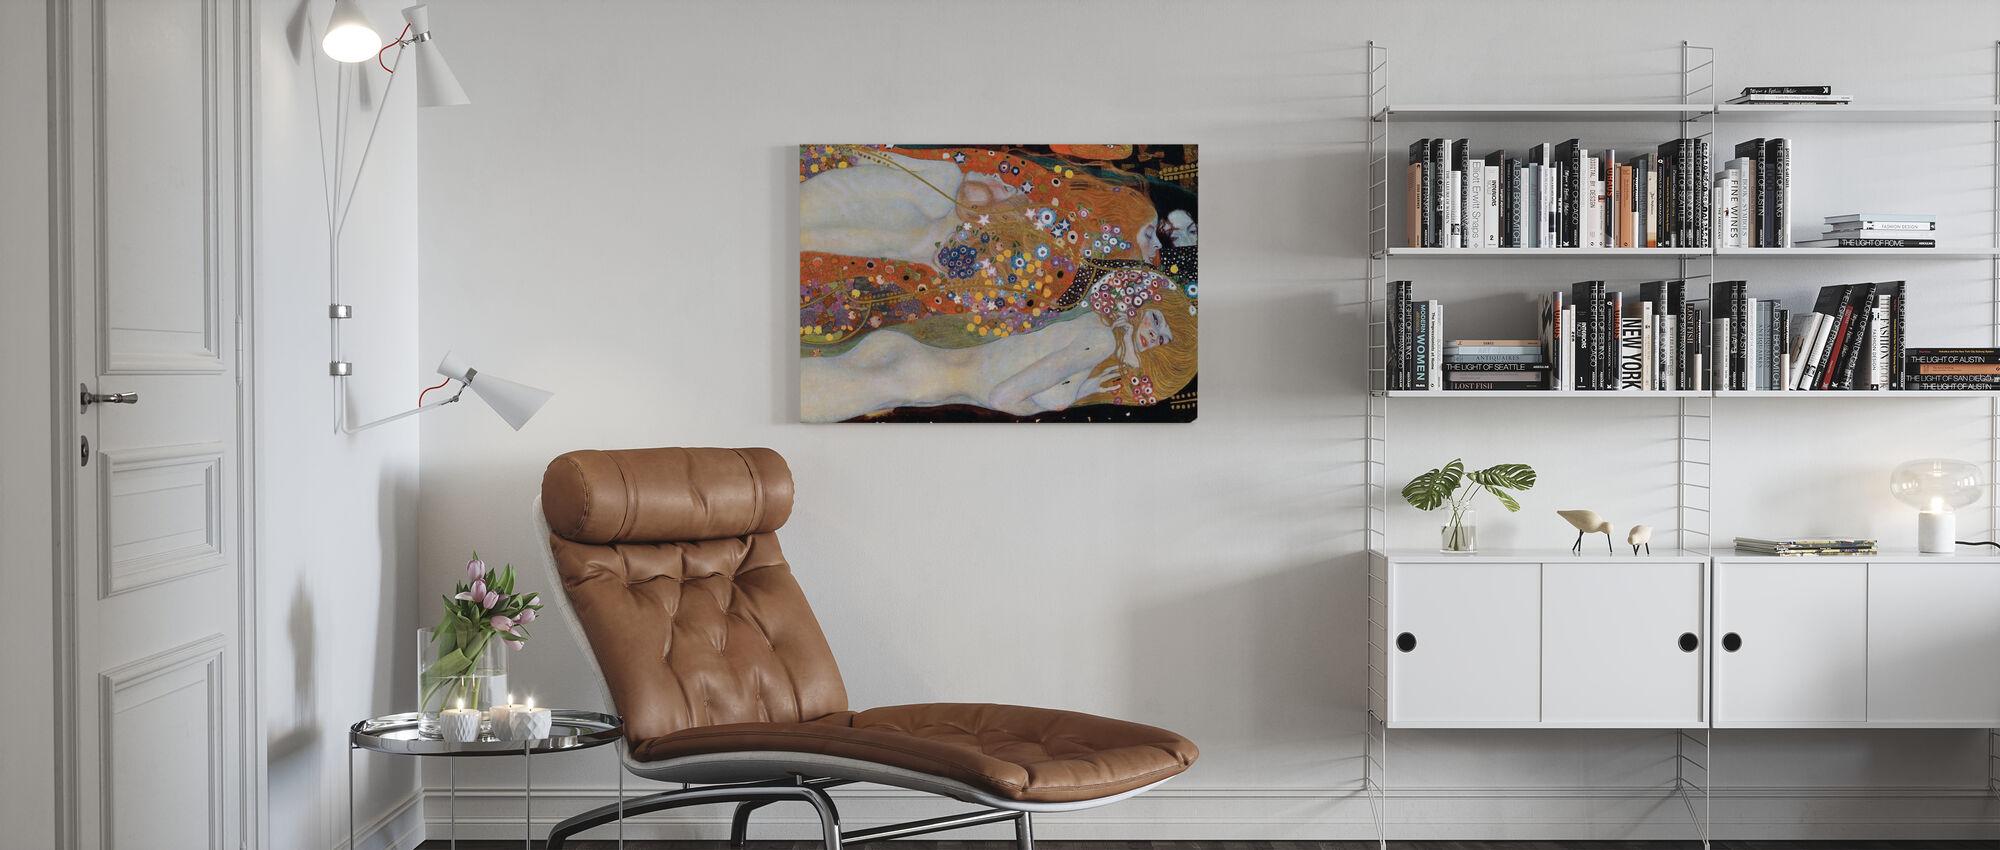 Water Serpents - Gustav Klimt - Canvas print - Living Room